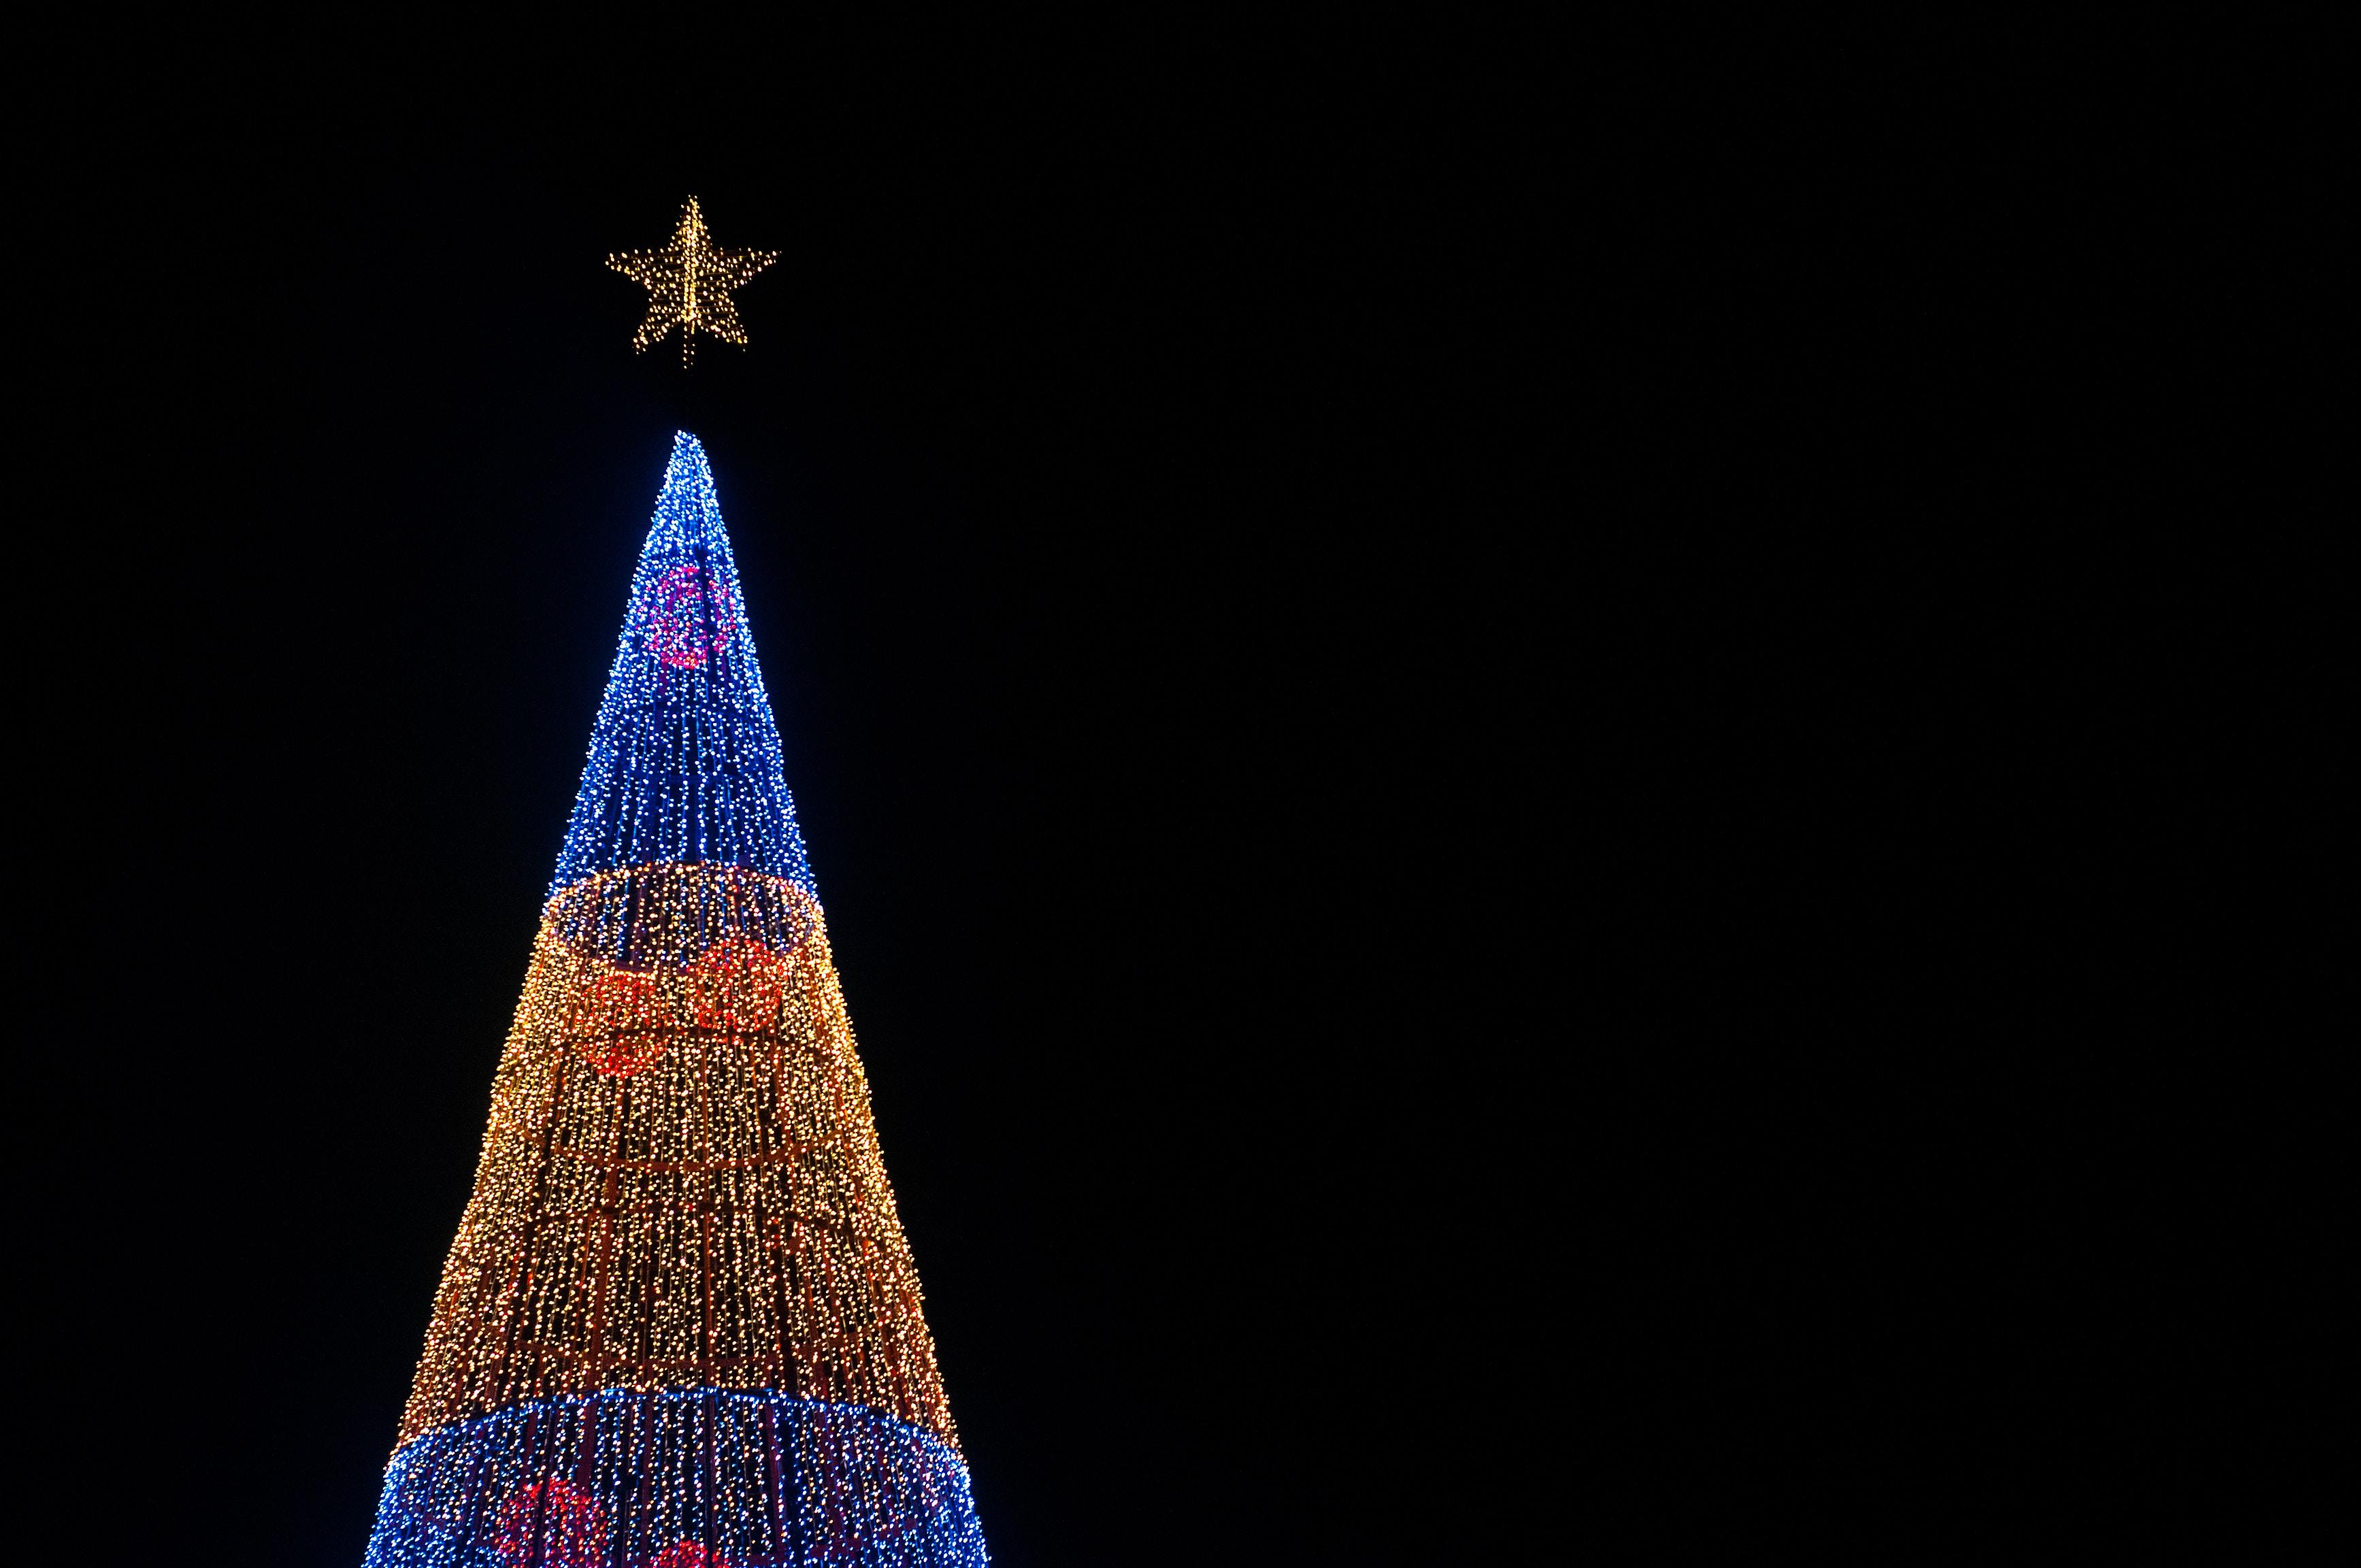 lighted Christmas tree under black sky